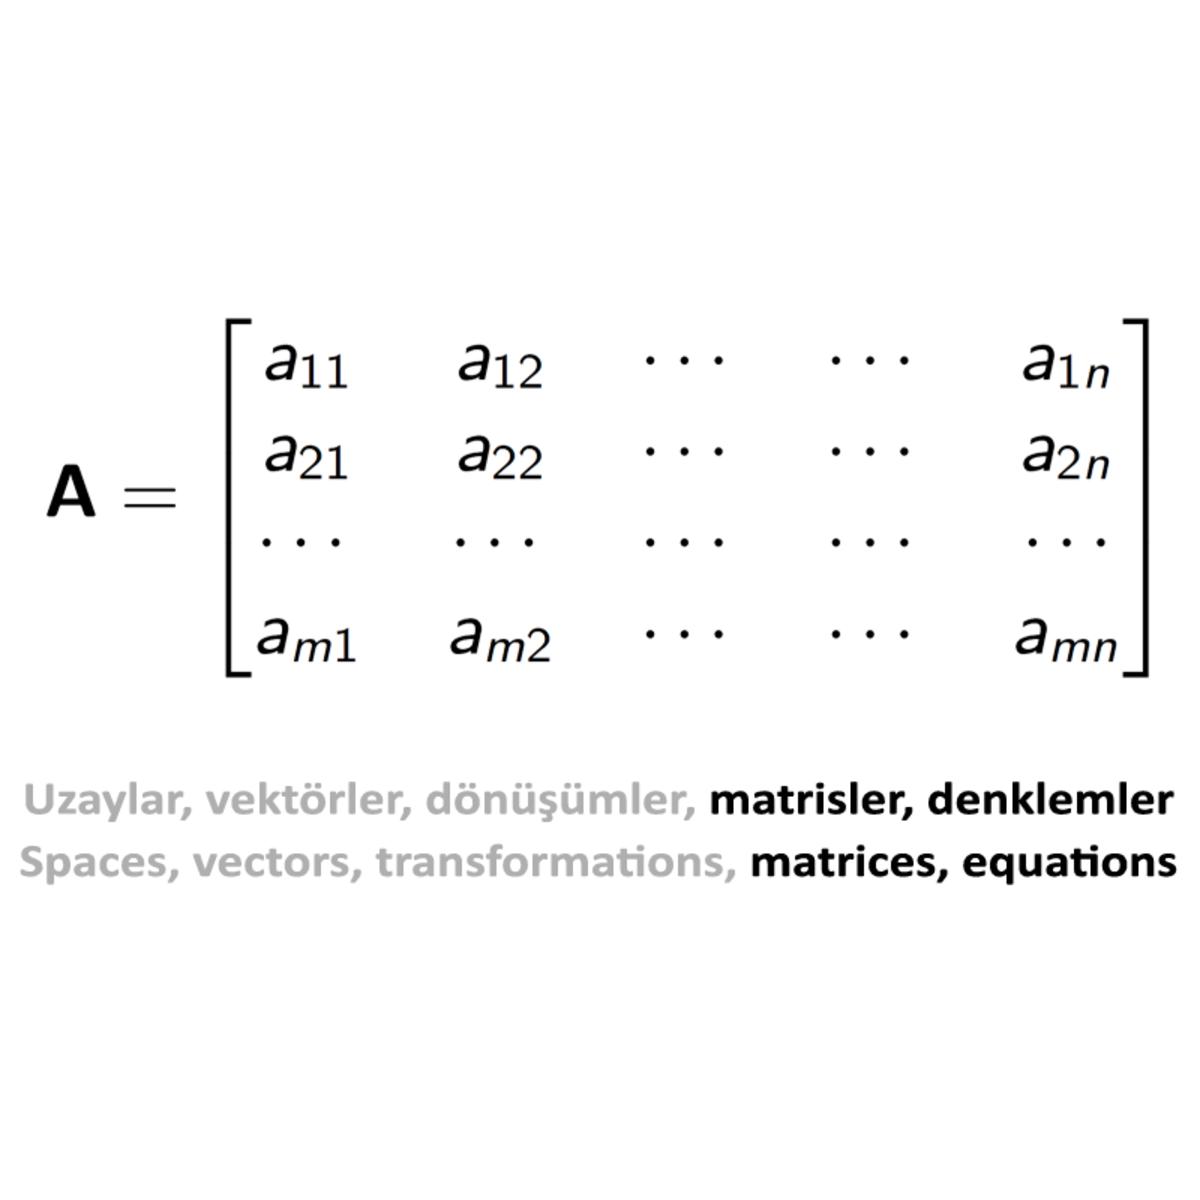 Doğrusal Cebir II: Kare Matrisler, Hesaplama Yöntemleri ve Uygulamalar / Linear Algebra II: Square Matrices, Calculation Methods and Applications course image